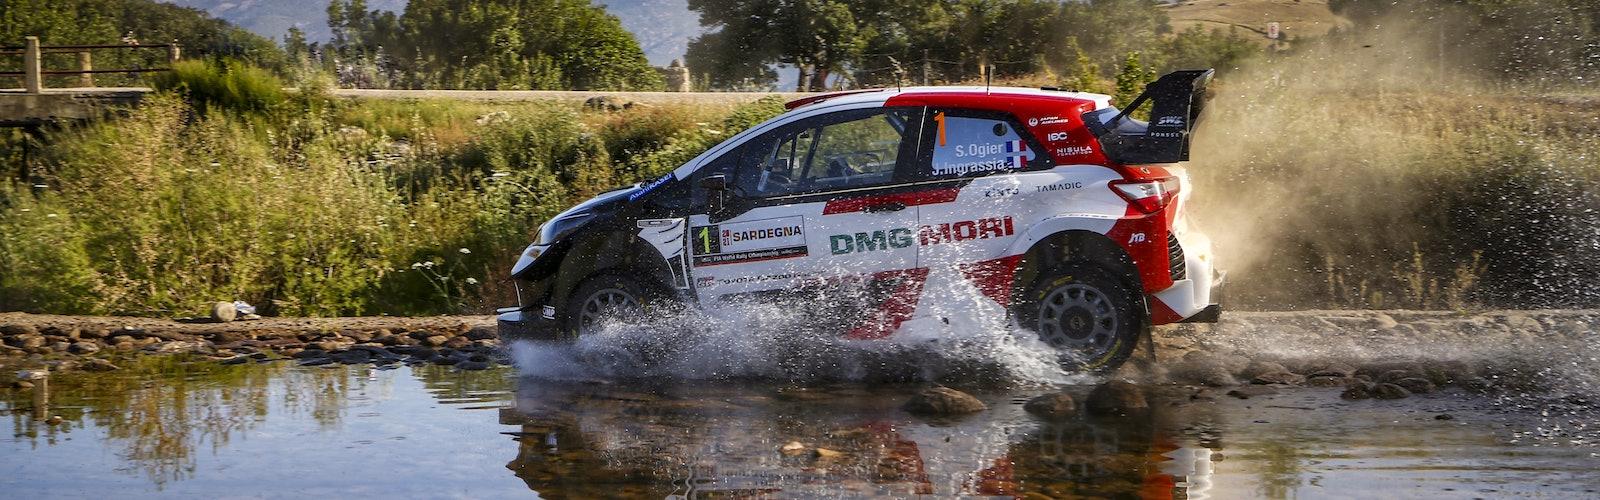 WRC_2021_Rd.5_137